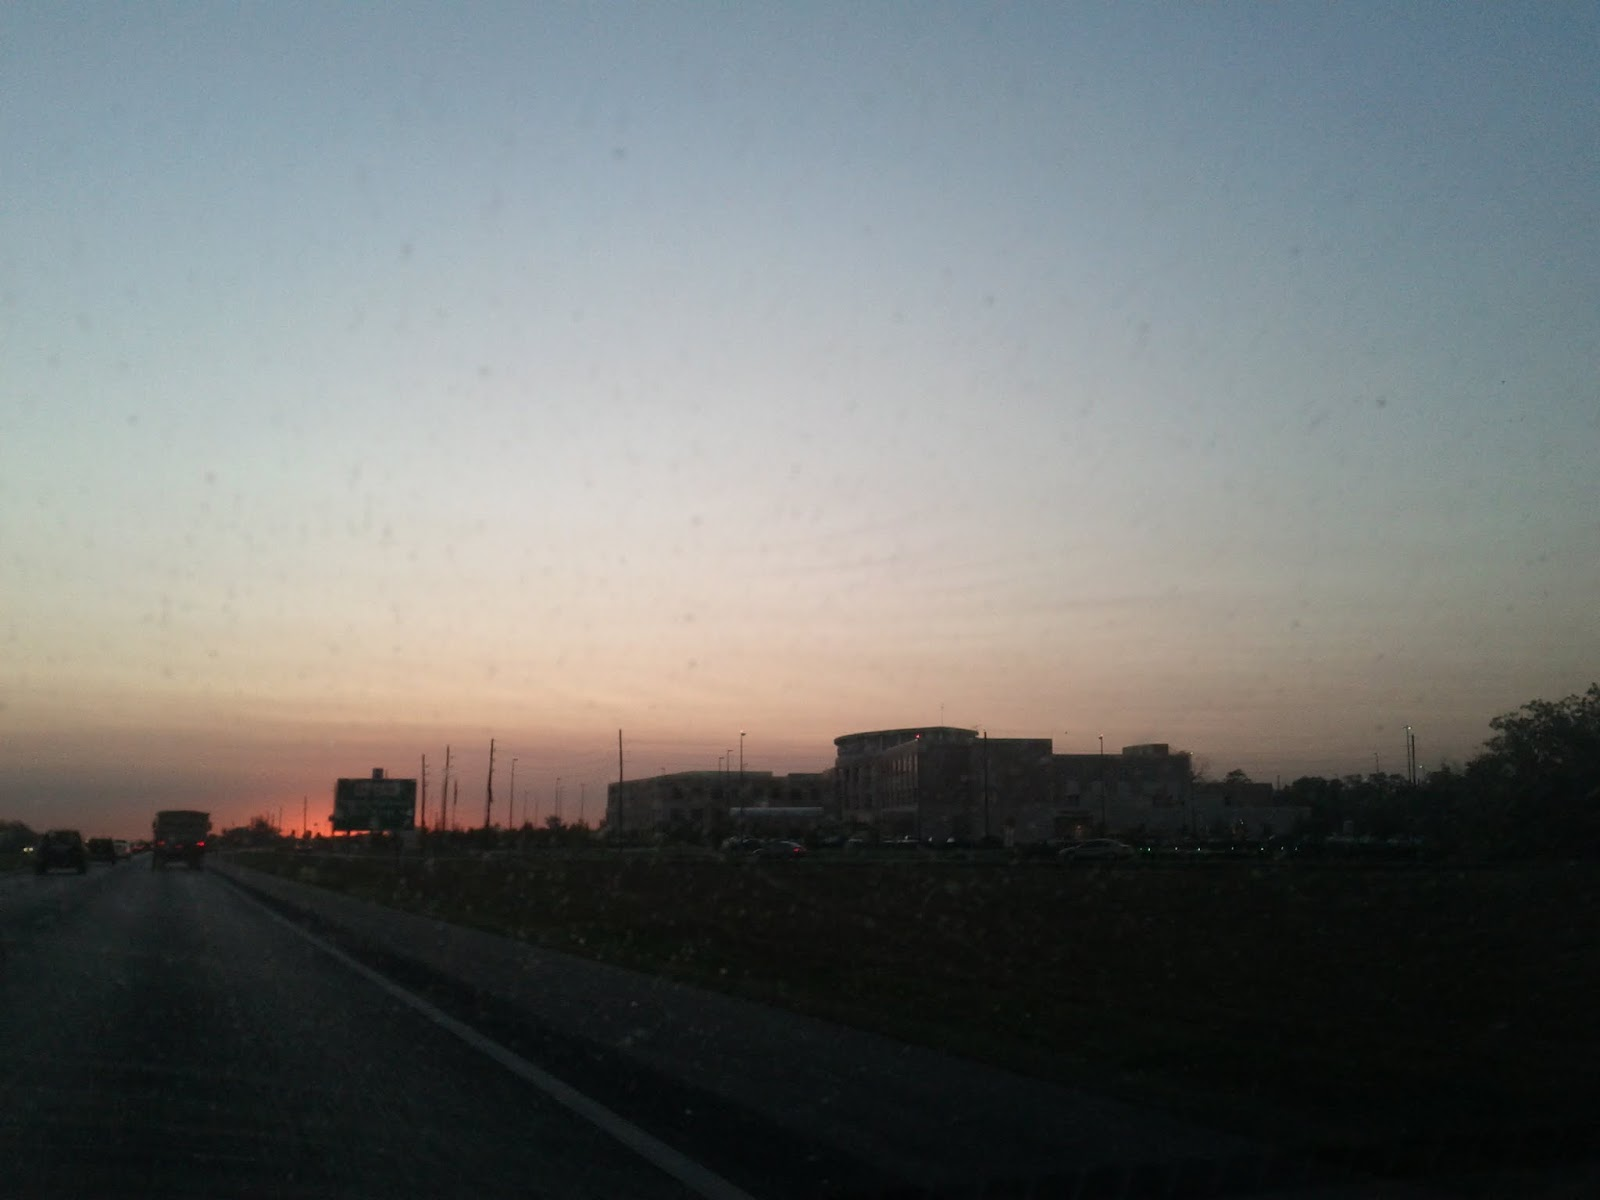 Sky - IMG_20110907_070049.jpg